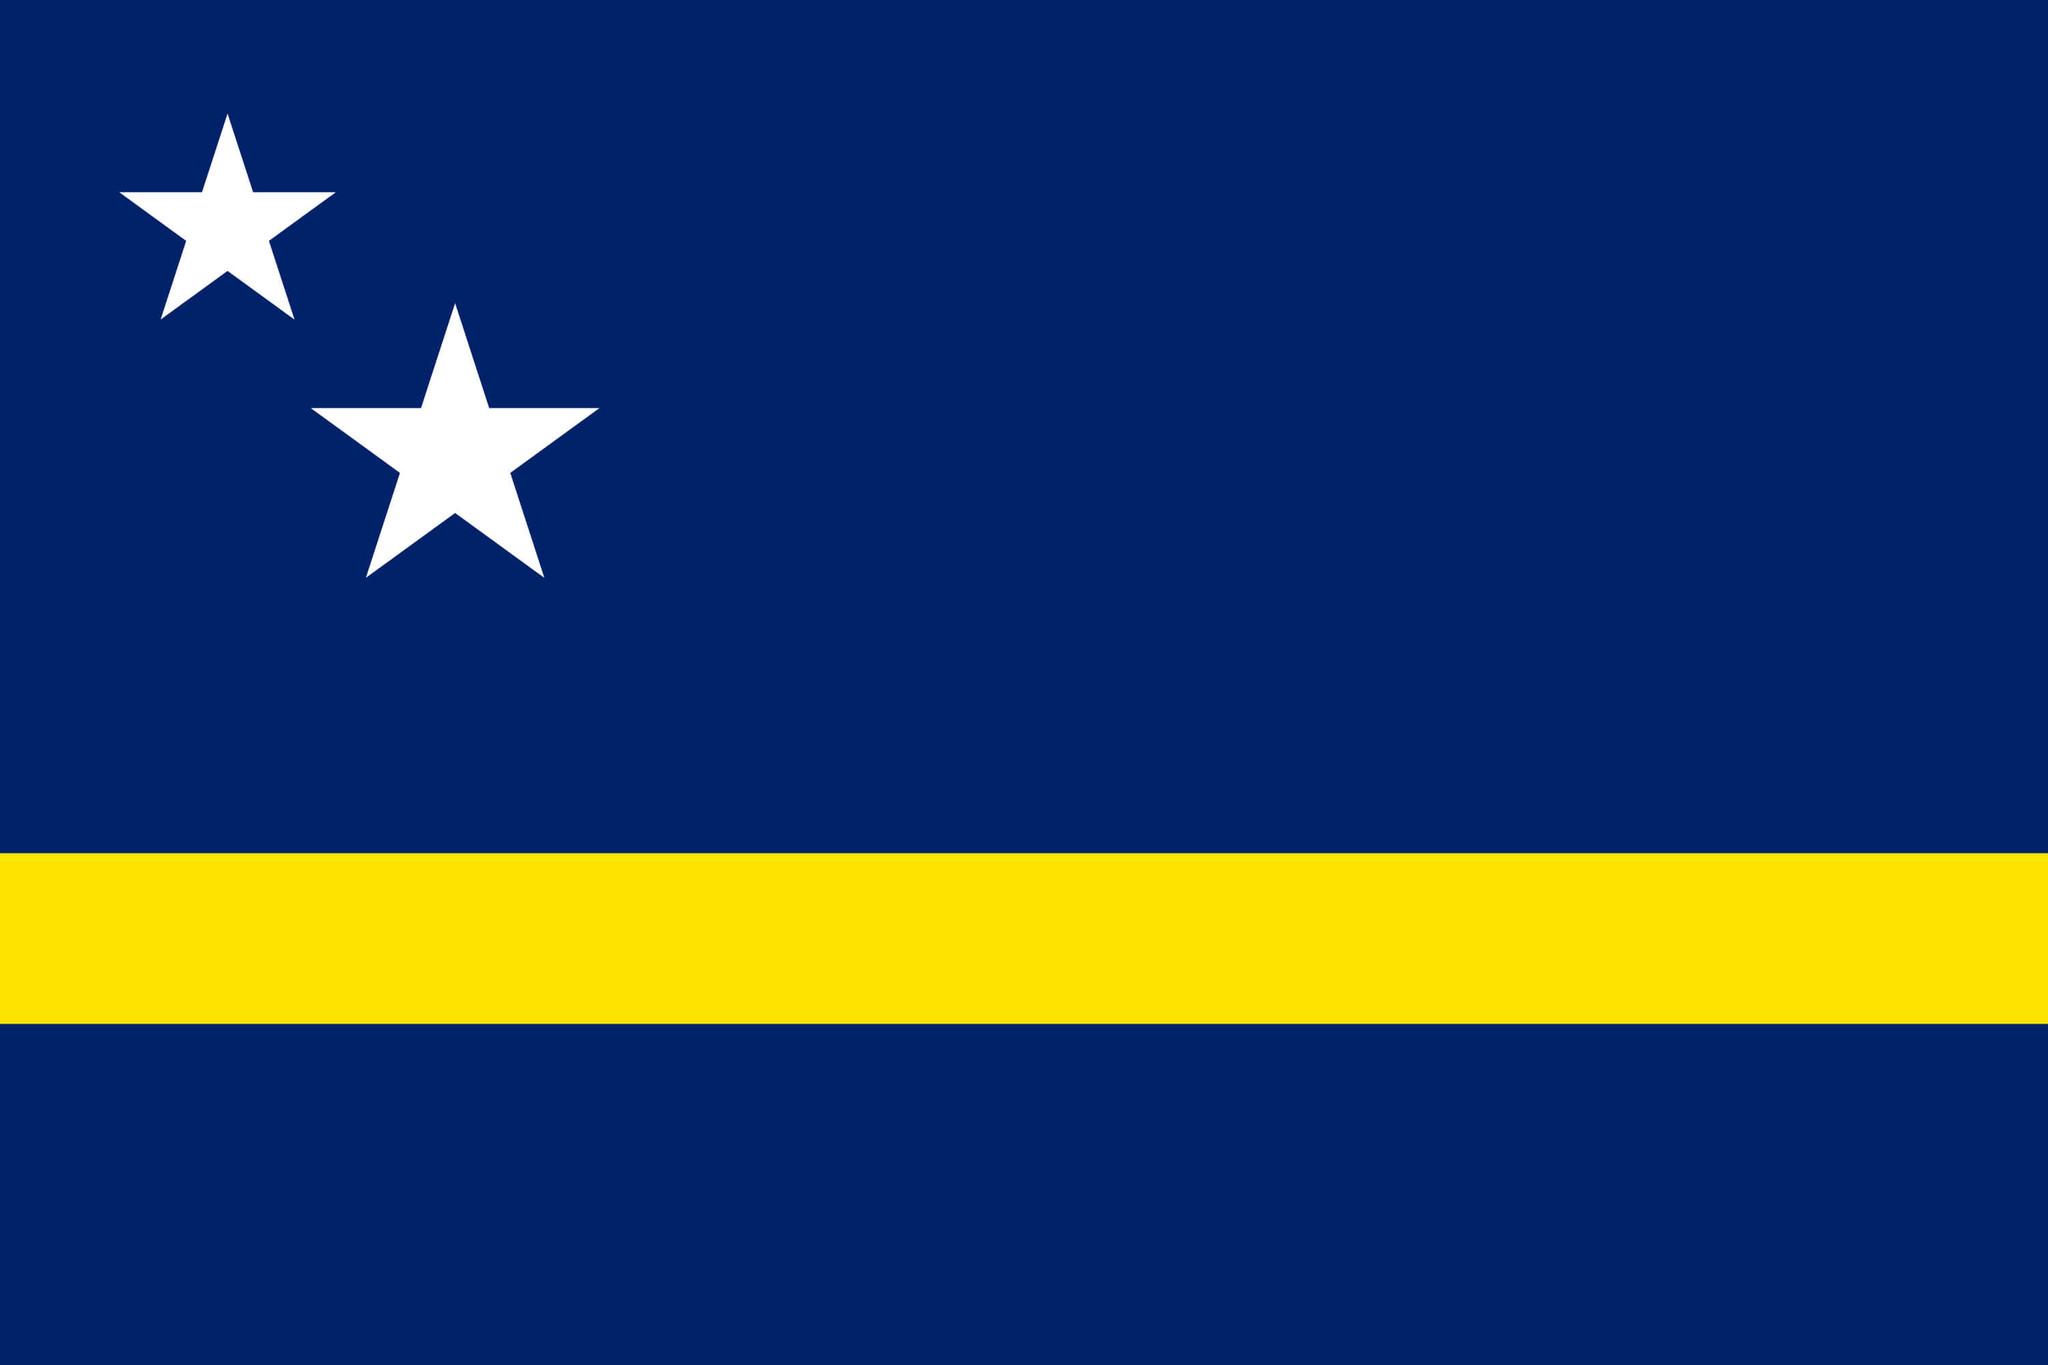 Flagge von Curaçao